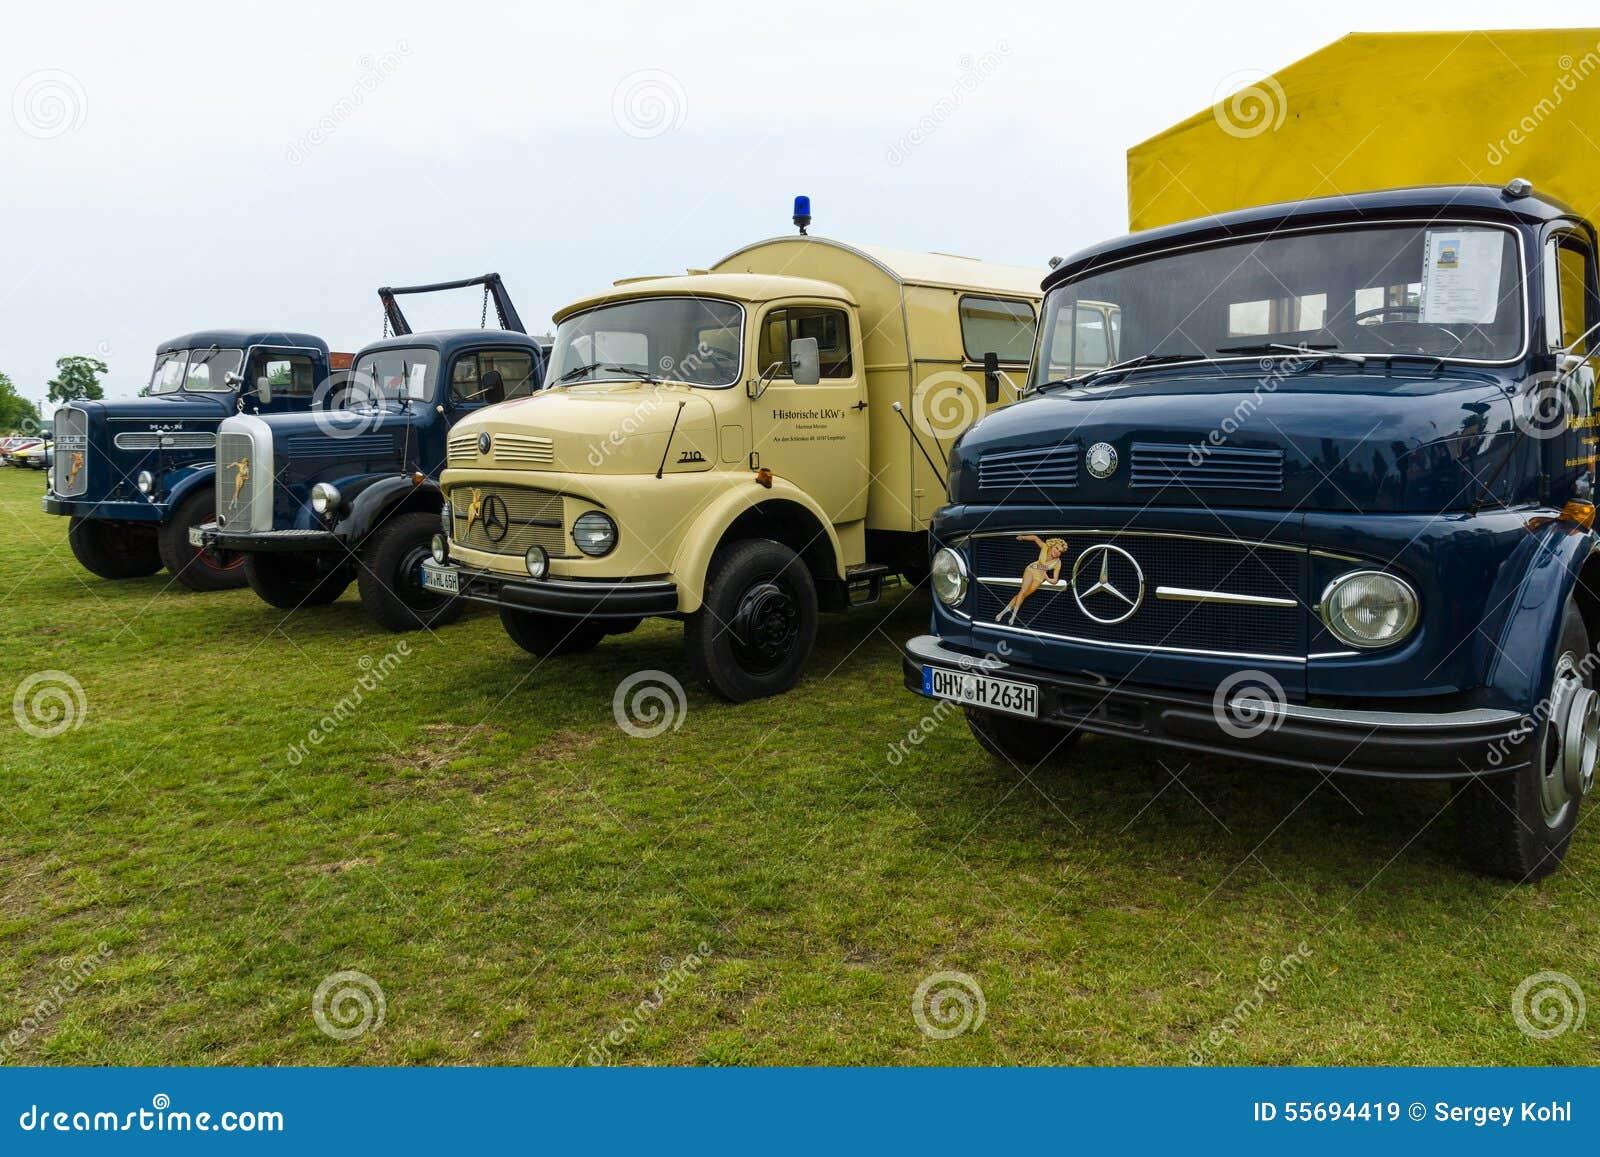 trucks daimler benz l323 mercedes benz la 710 daimler benz laf 311 36 and man 620 l1. Black Bedroom Furniture Sets. Home Design Ideas